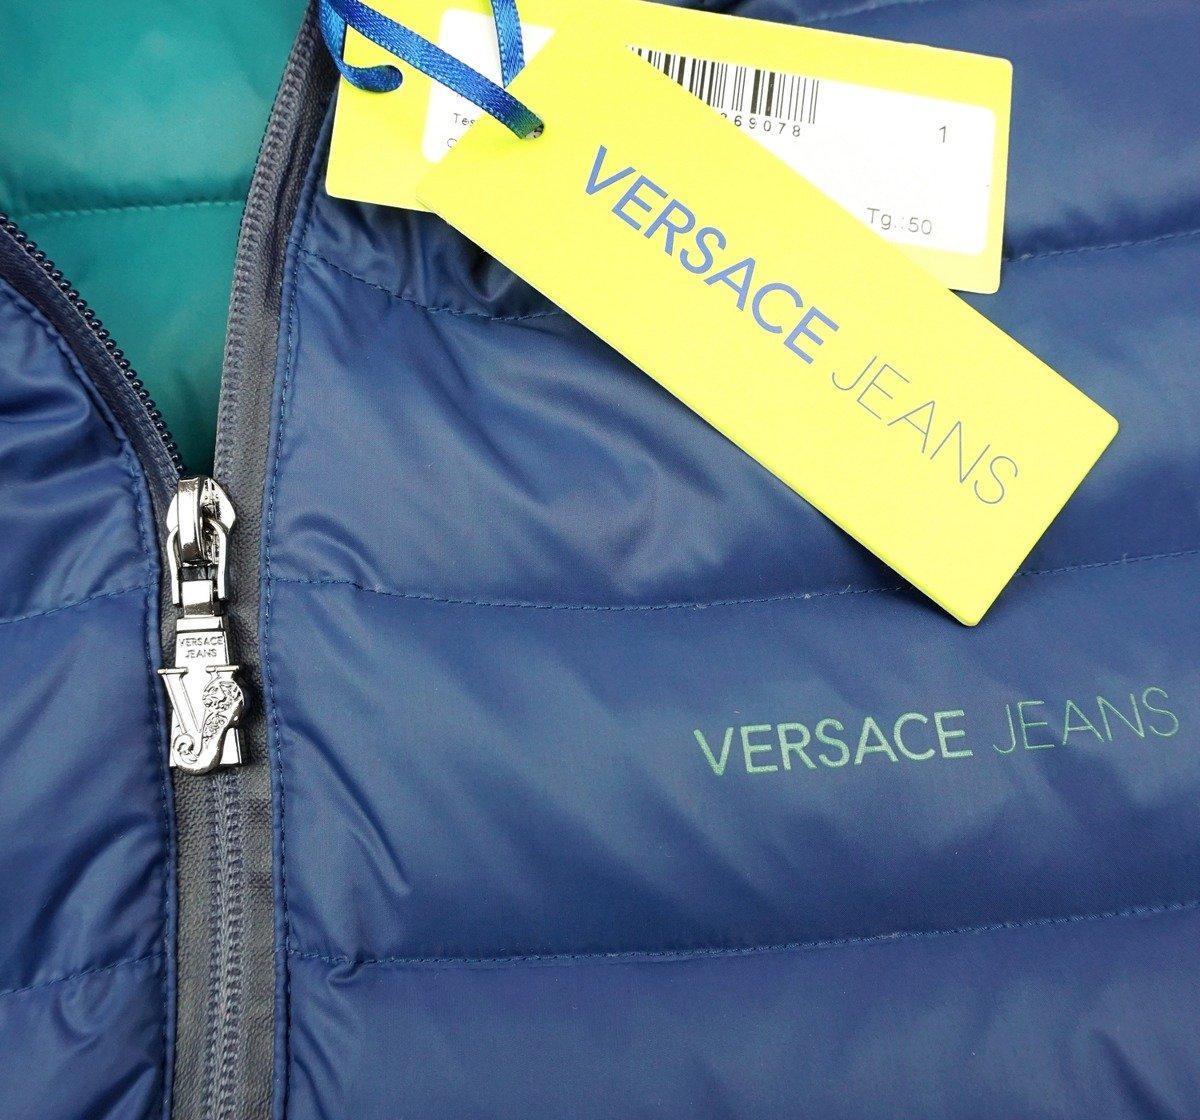 Details about VERSACE JEANS E5GNA907 Herren Men Daunenjacke Down Jacket Blau Blue L,XL,XXL